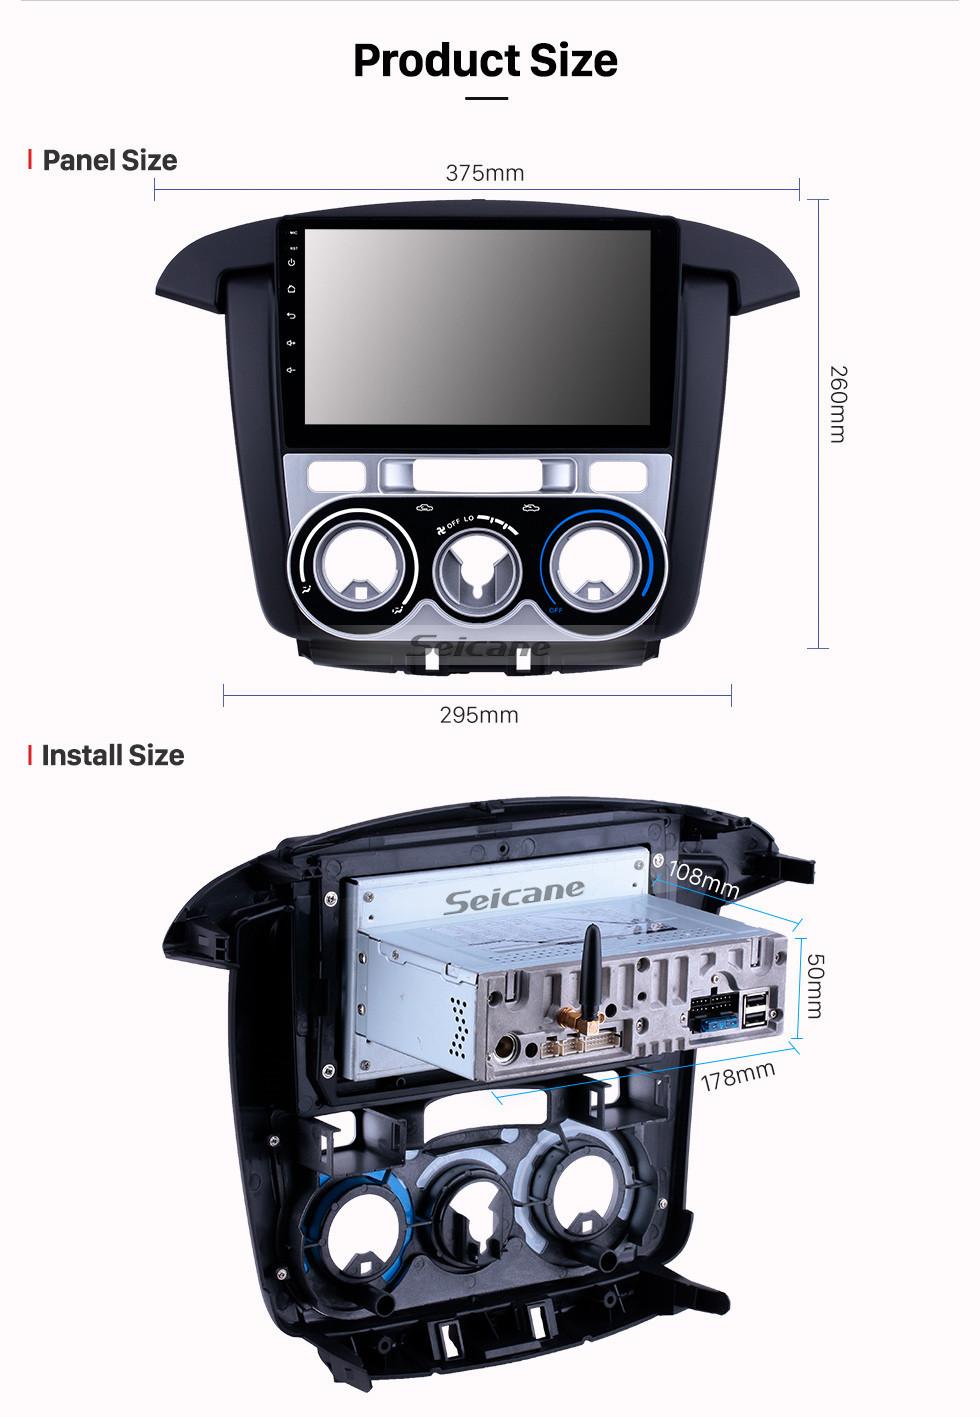 Seicane OEM 9 inch Android 10.0 Radio for 2007-2011 Toyota Innova Manual A/C Bluetooth Wifi HD Touchscreen GPS Navigation Carplay USB support Digital TV TPMS